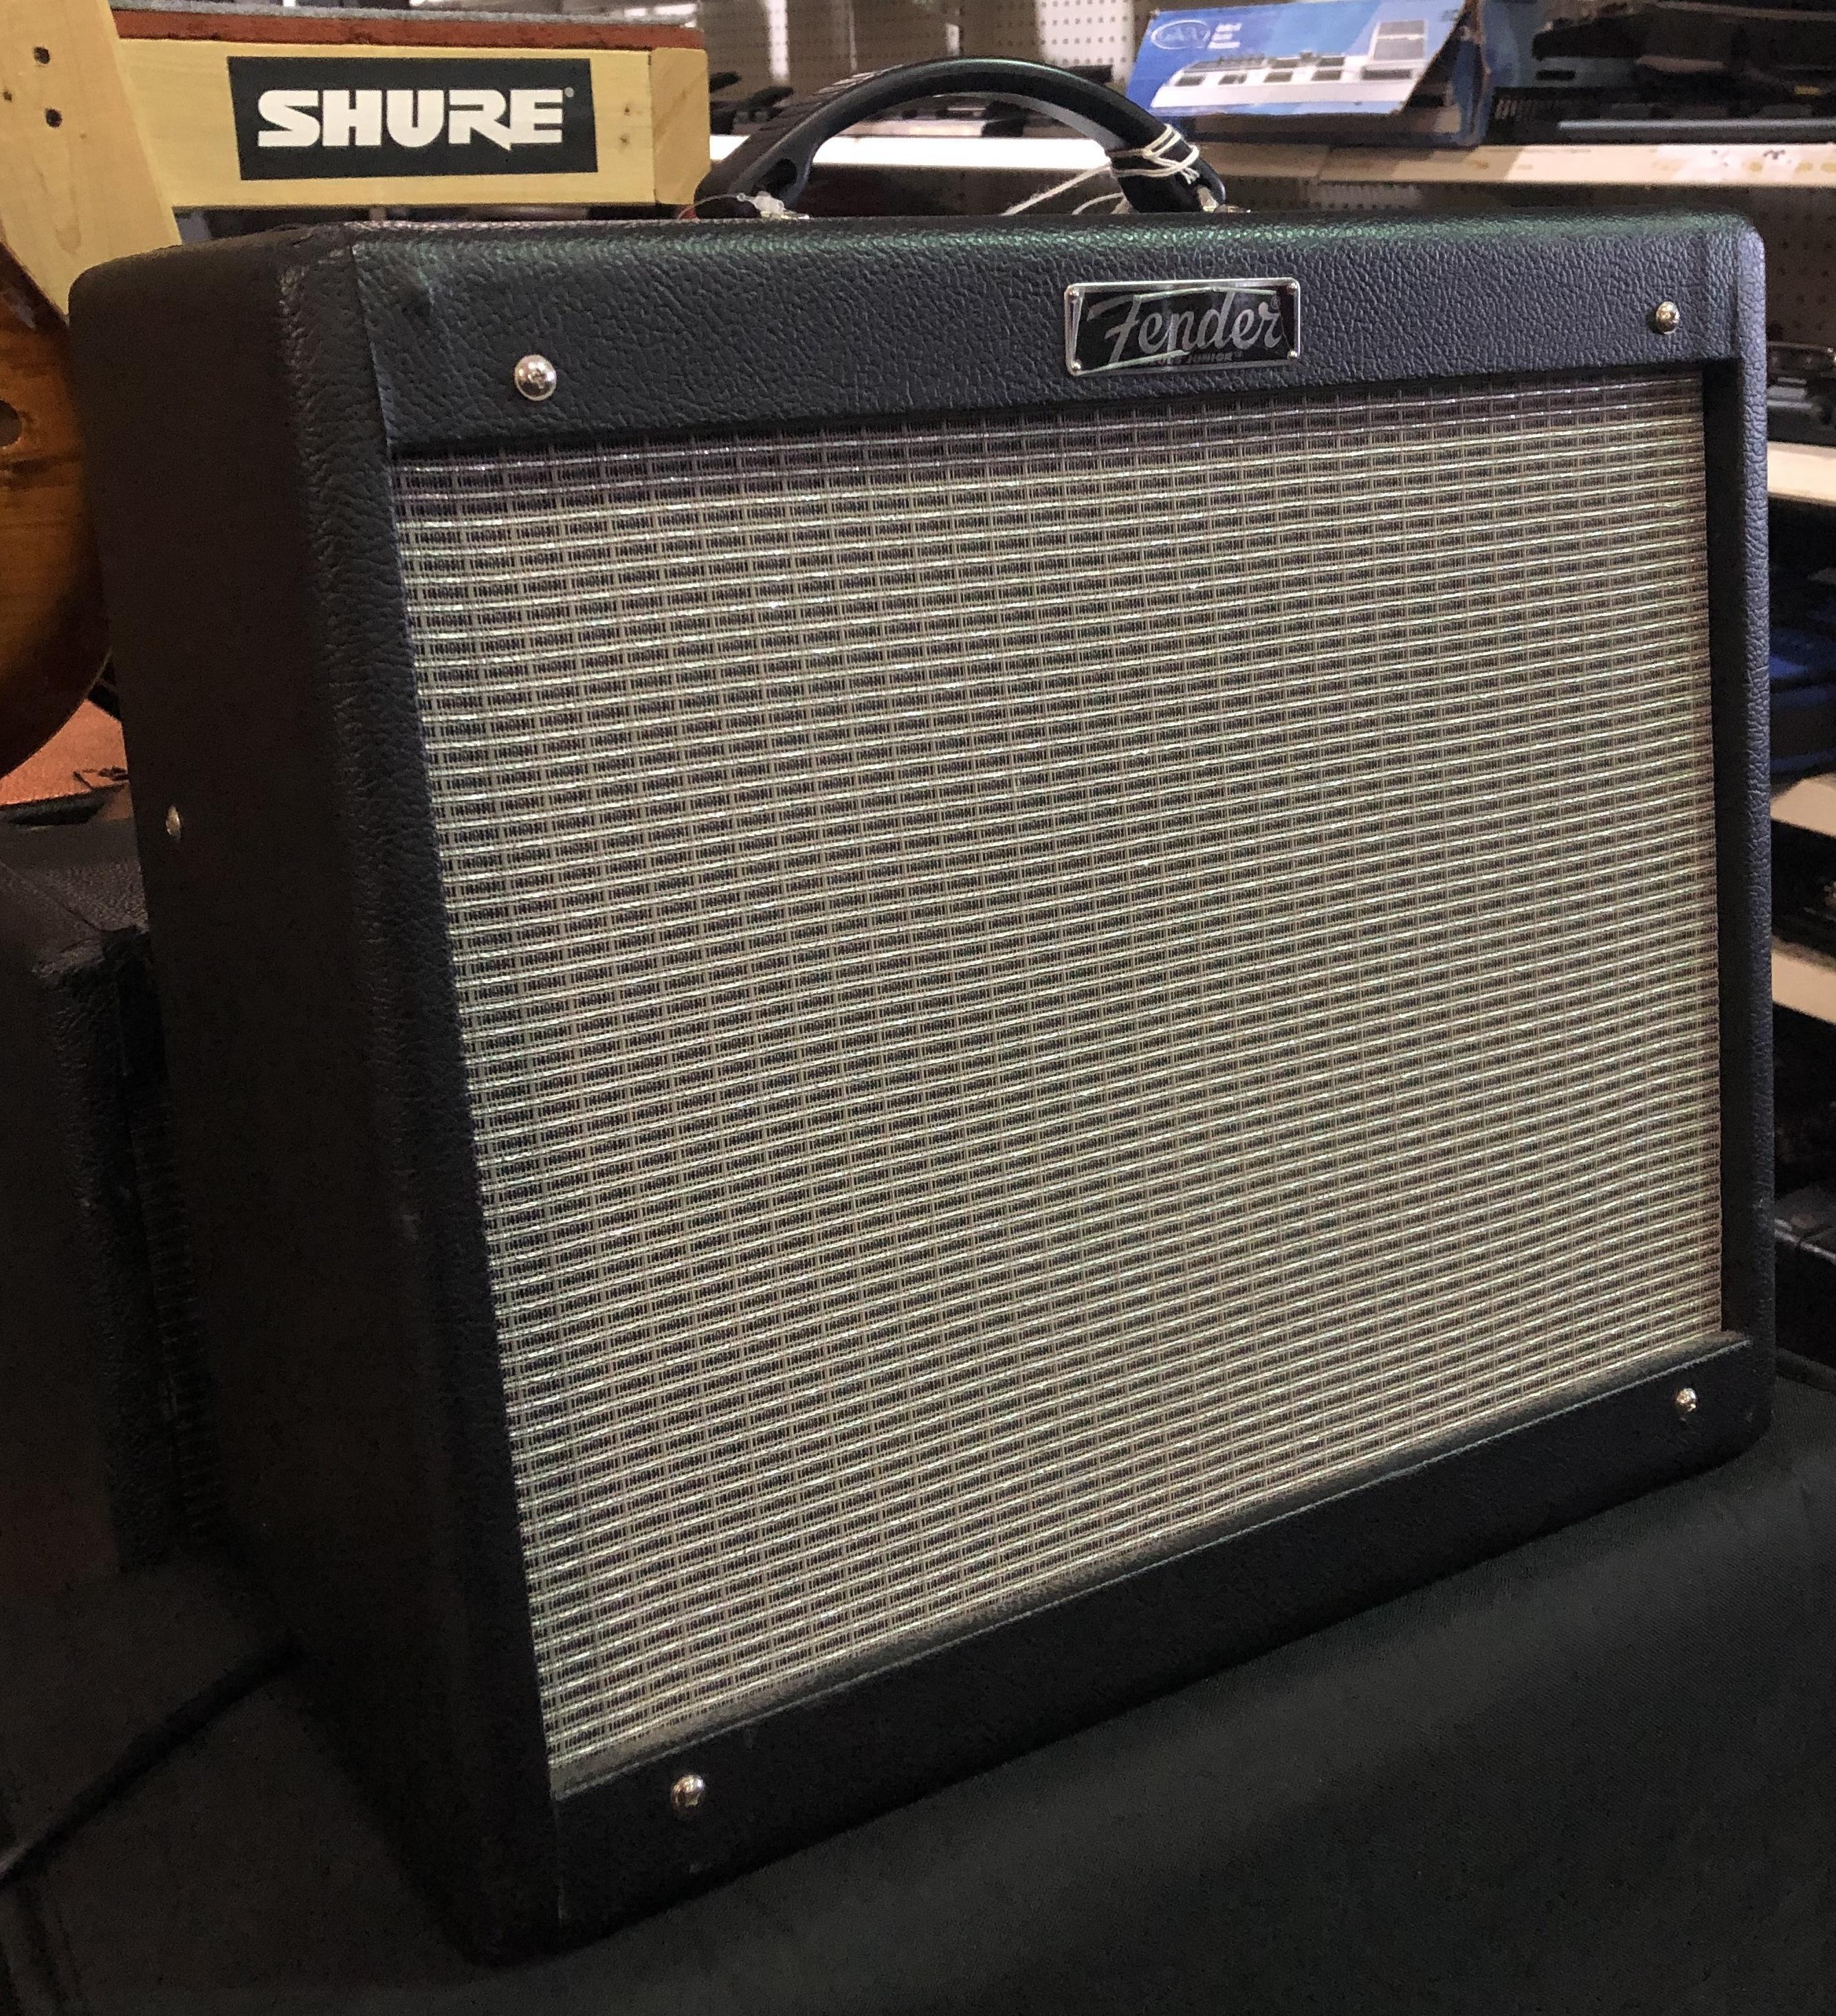 FENDER - Blues Jr. III Guitar Amplifier Combo